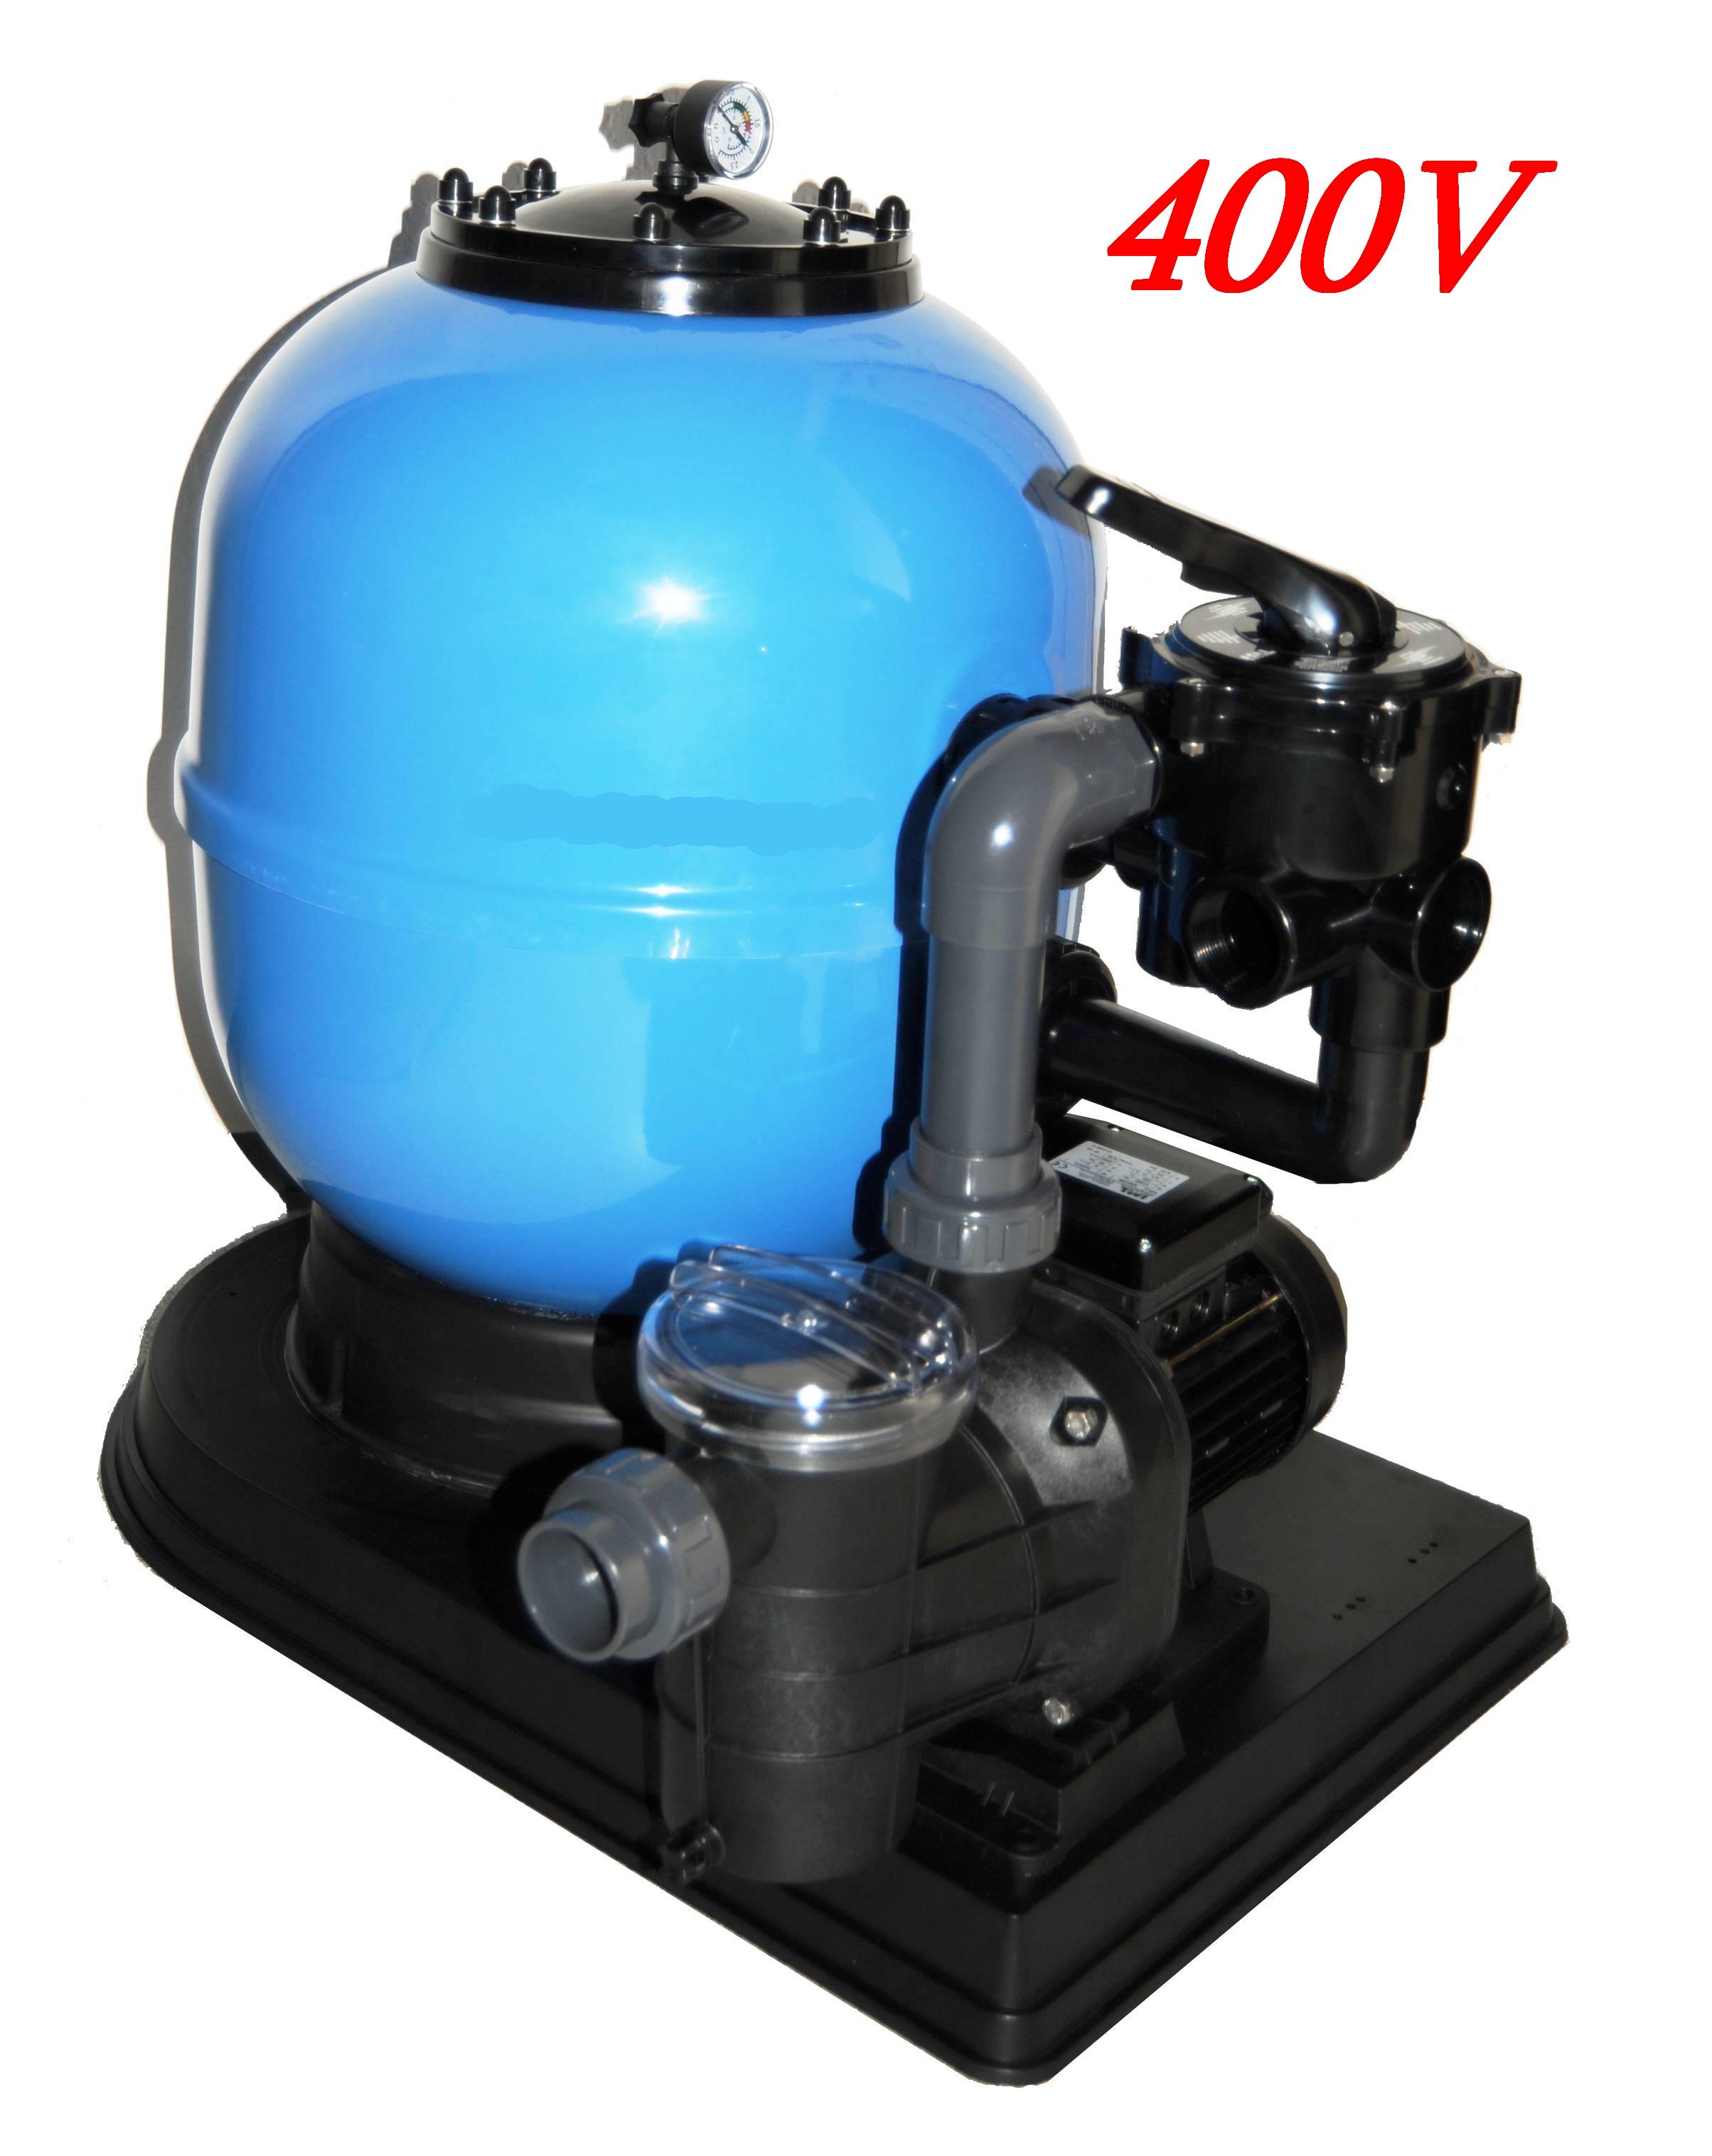 Sandfilteranlage LISBOA 600 - mit TORPEDO 100 - 400V !! - 15 m3/h